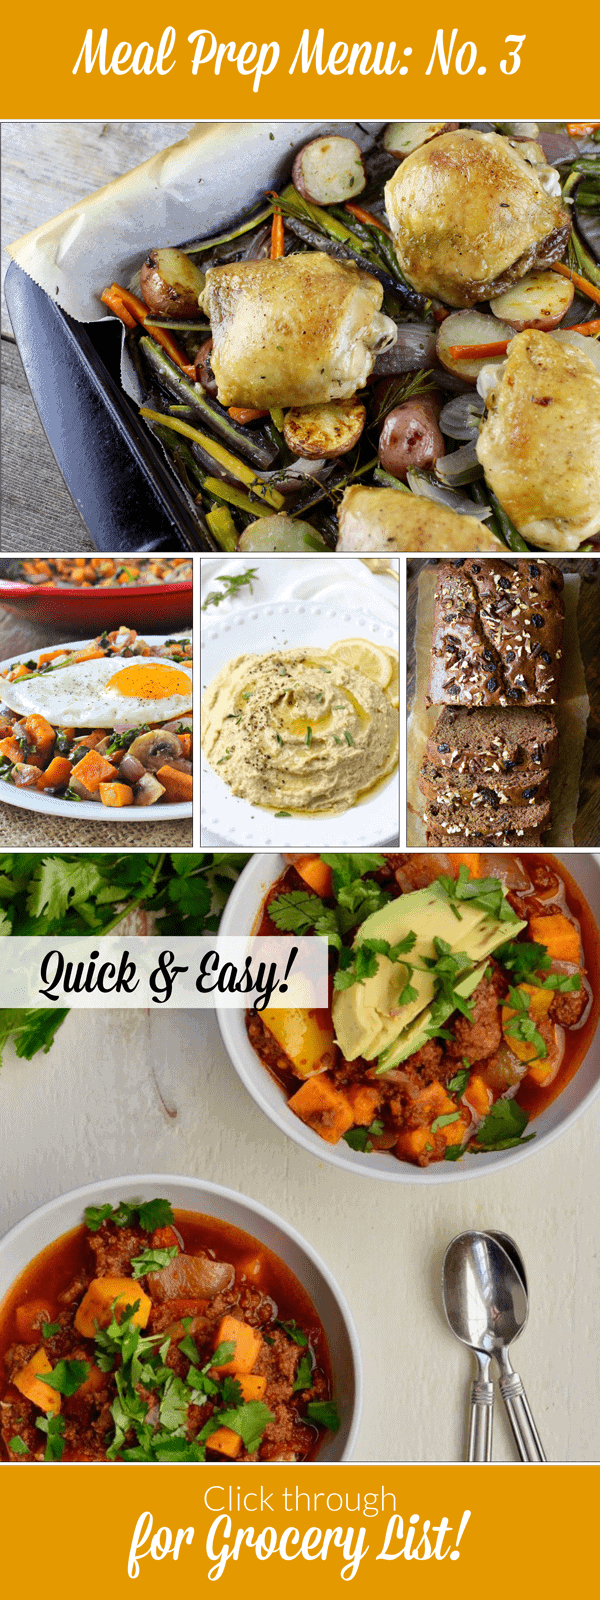 Weekly Meal Prep Menu: No. 3   The Real Food Dietitians   https://therealfooddietitians.com/weekly-meal-prep-menu-no-3/